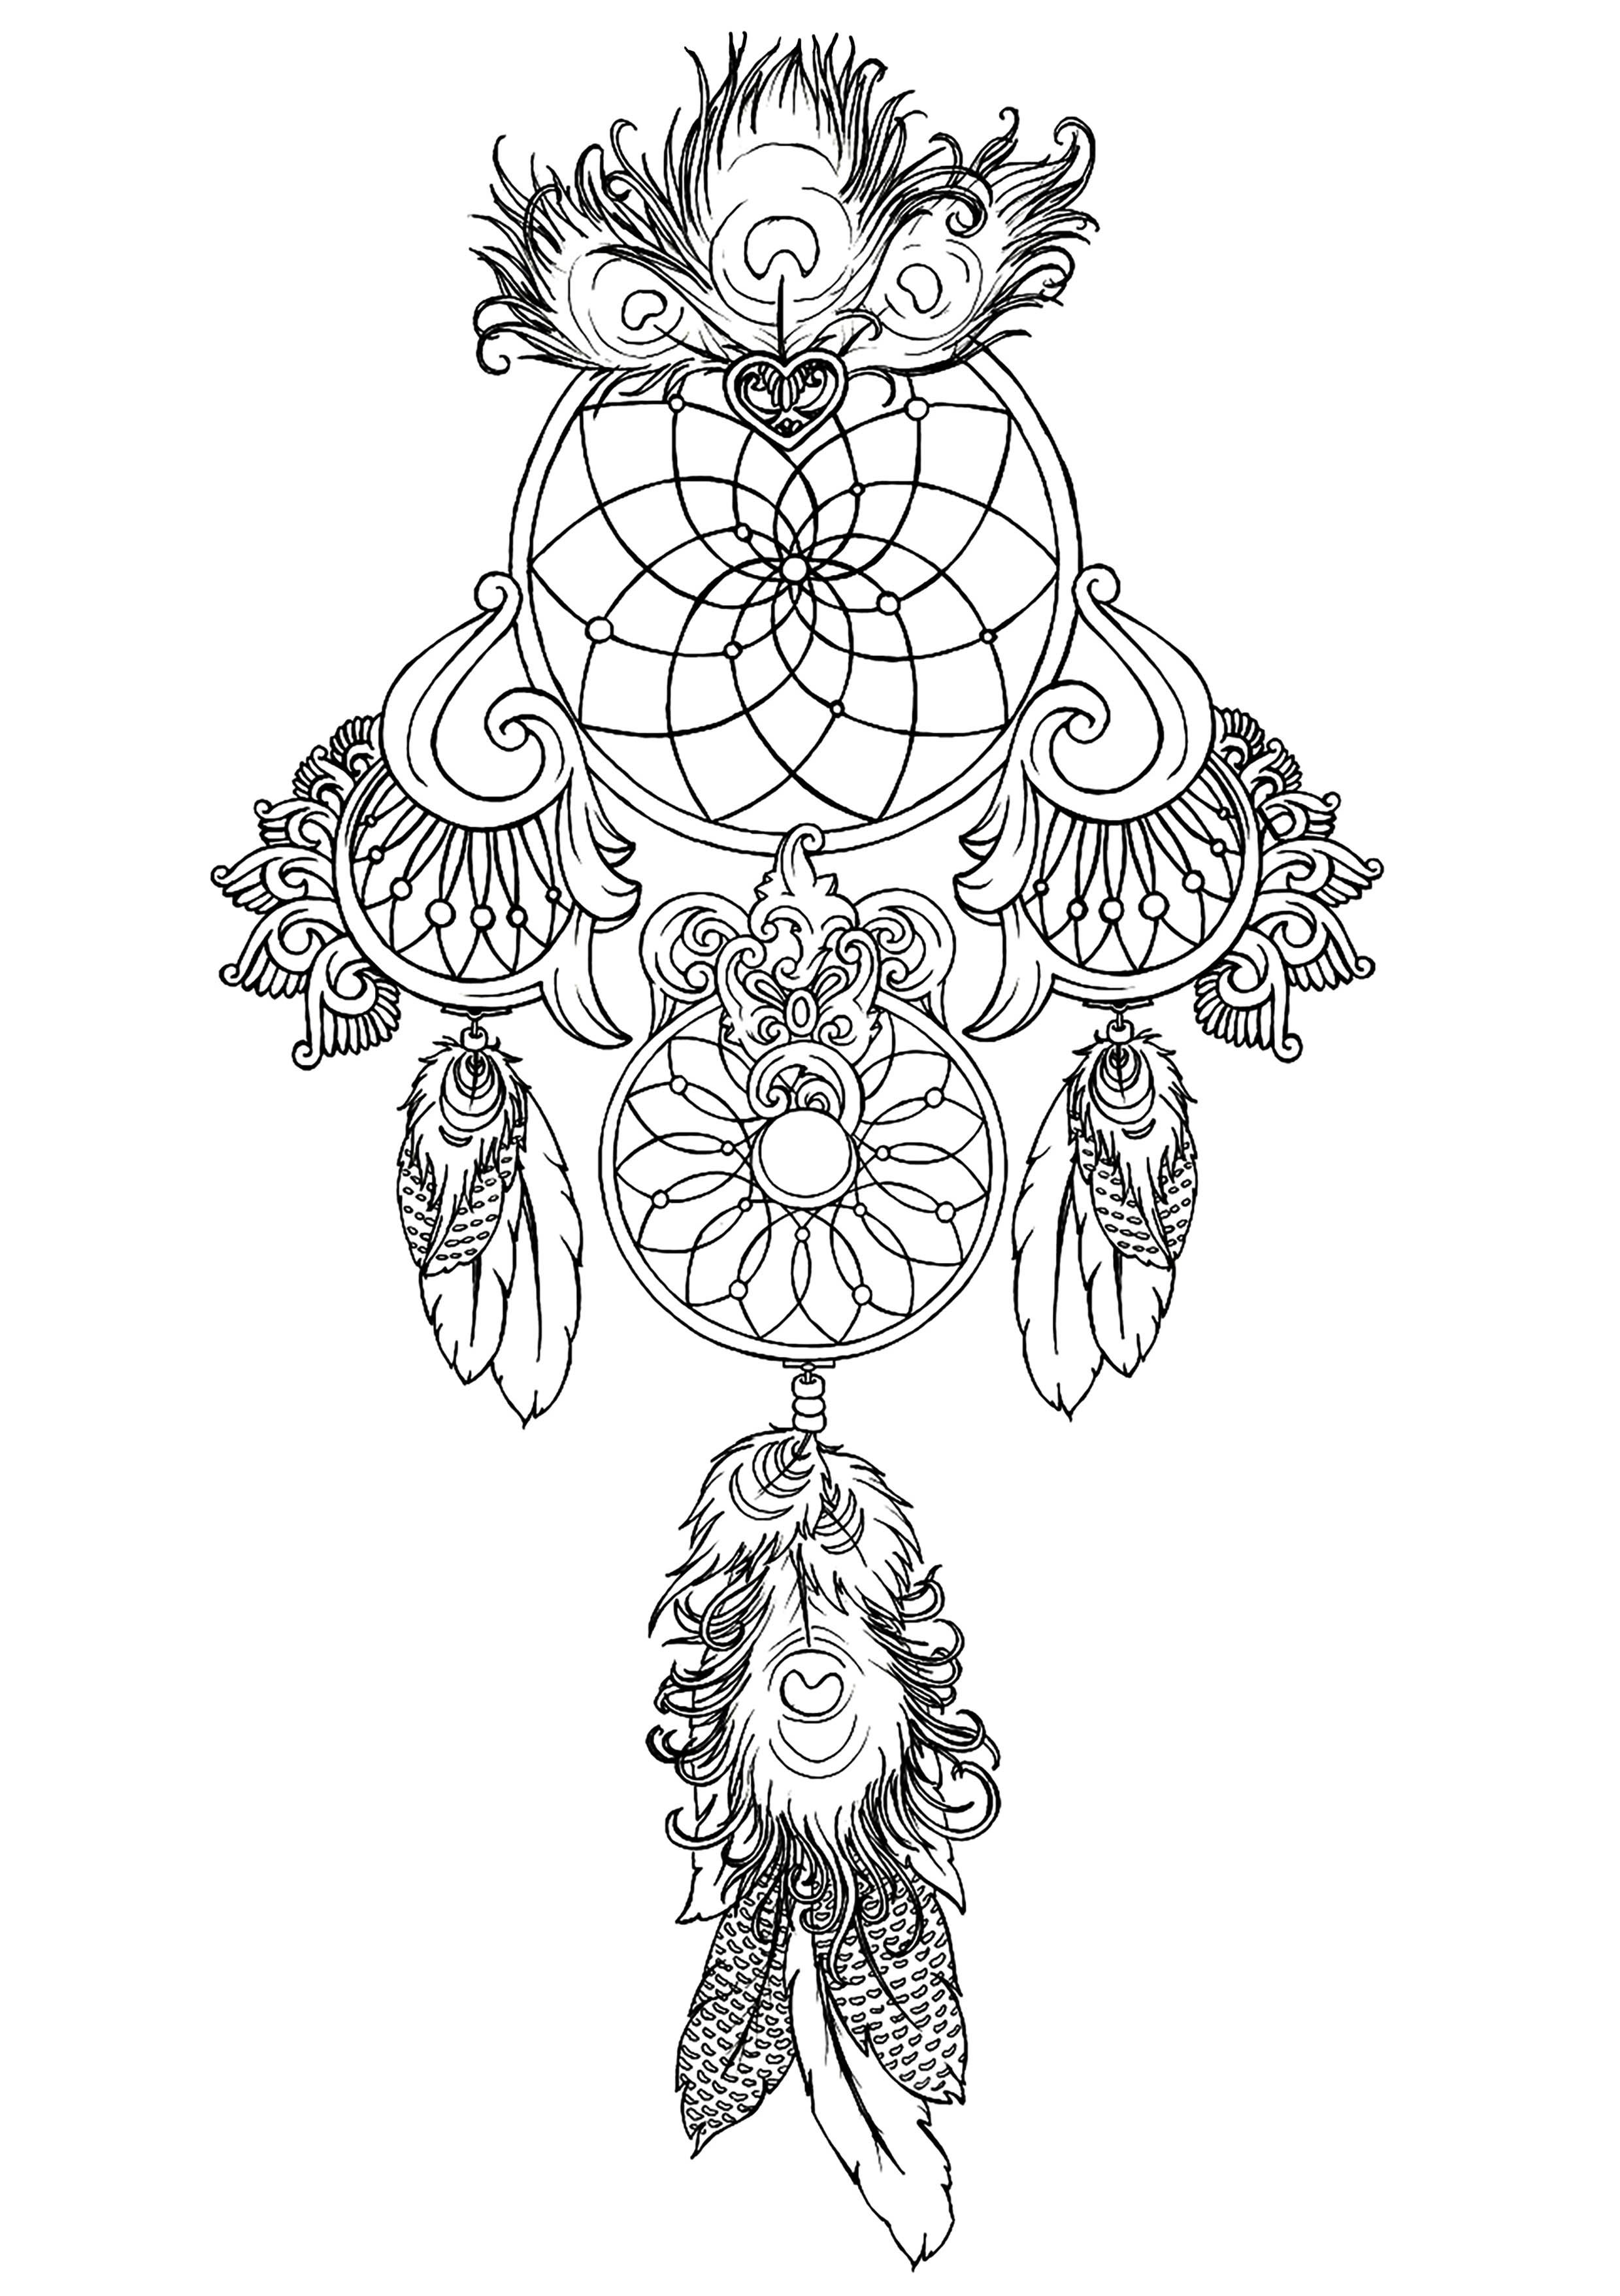 Dreamcatcher To Print 1 | Zen And Anti Stress - Coloring à Coloriage Zen